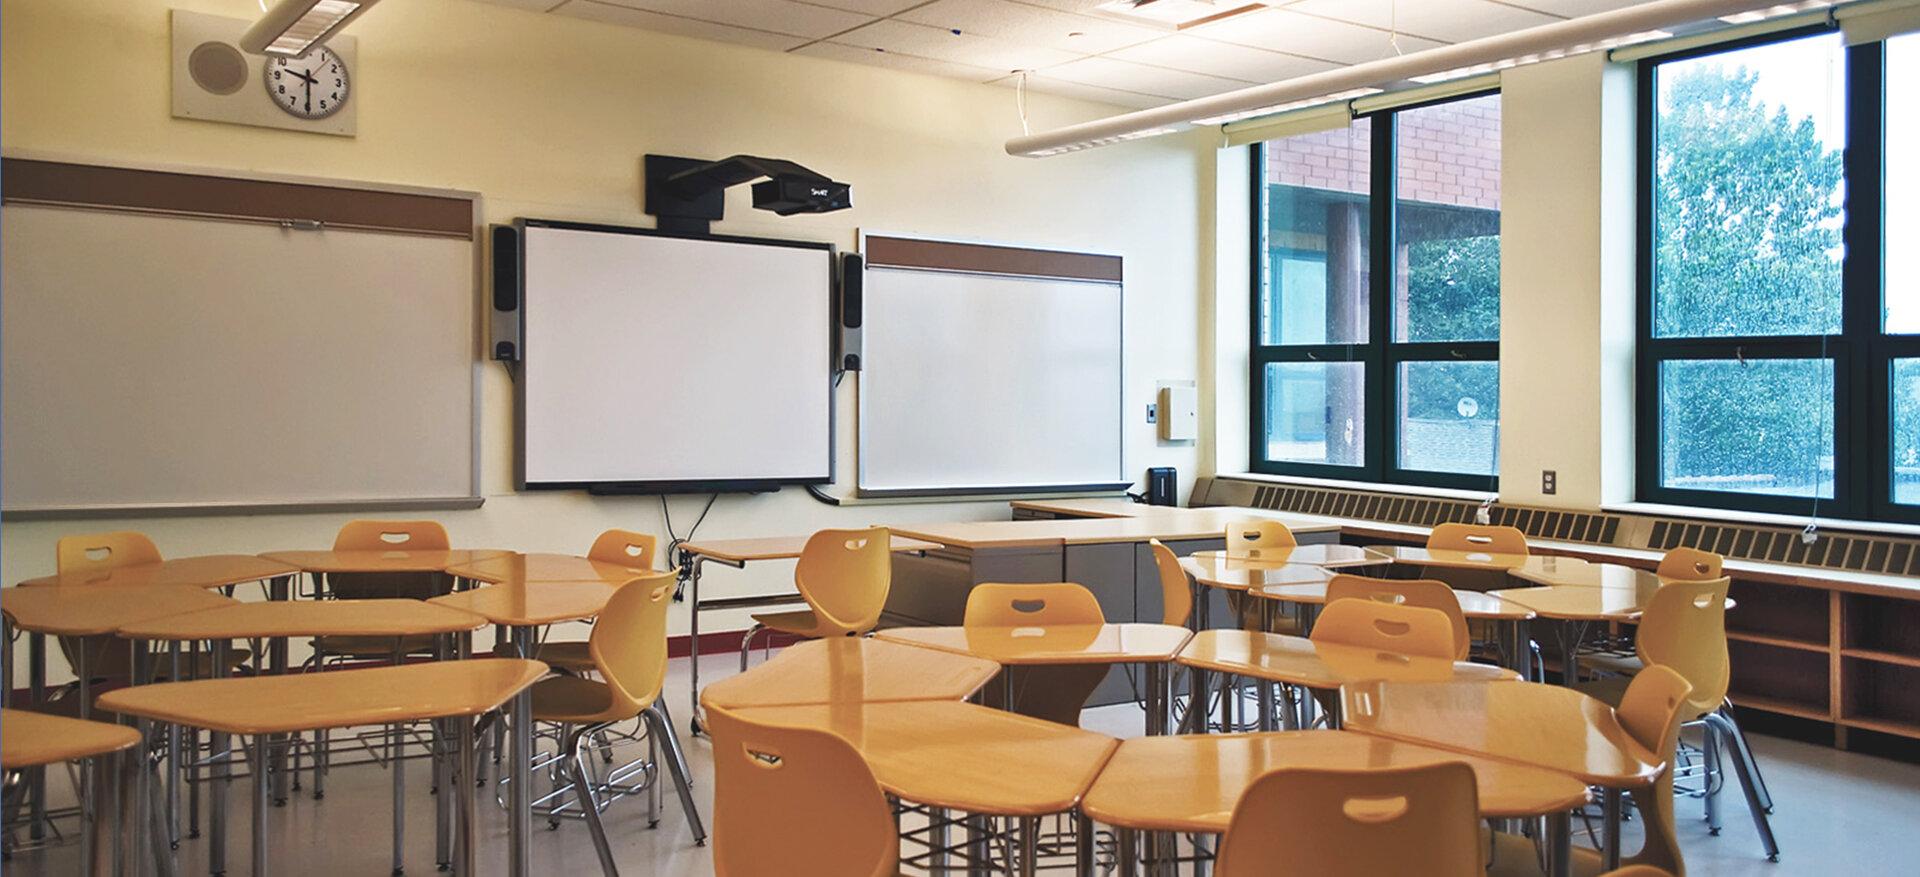 PS89K Classroom HOR.jpg